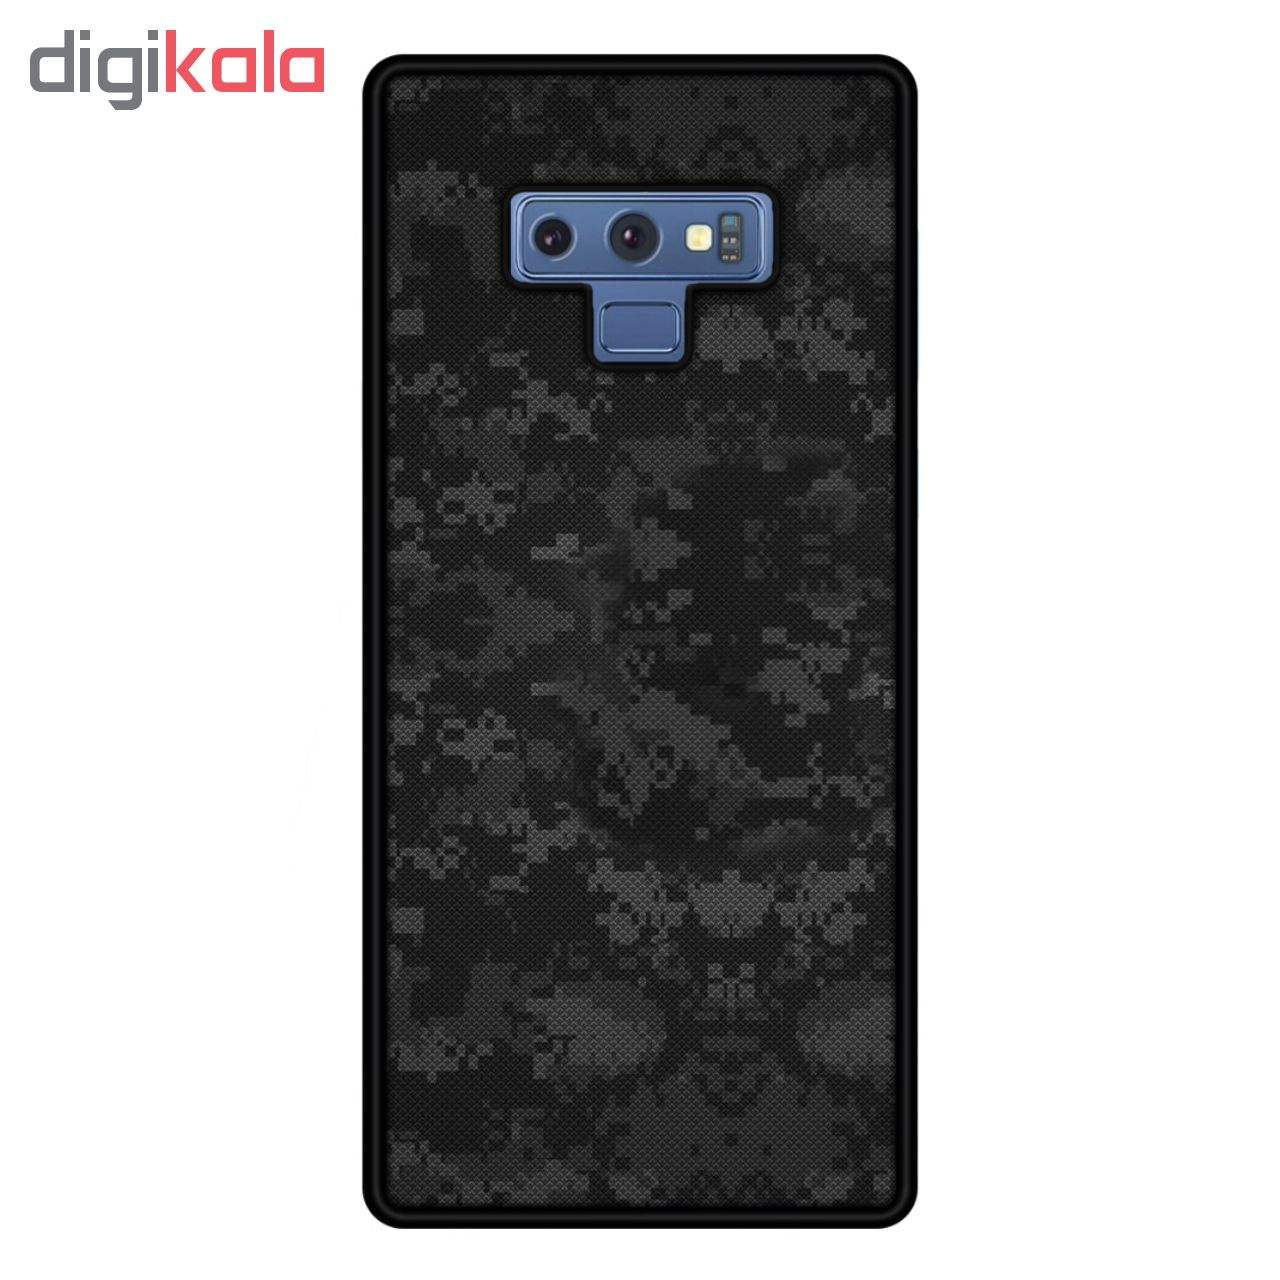 کاور آکام مدل AN91531 مناسب برای گوشی موبایل سامسونگ Galaxy Note 9 main 1 1